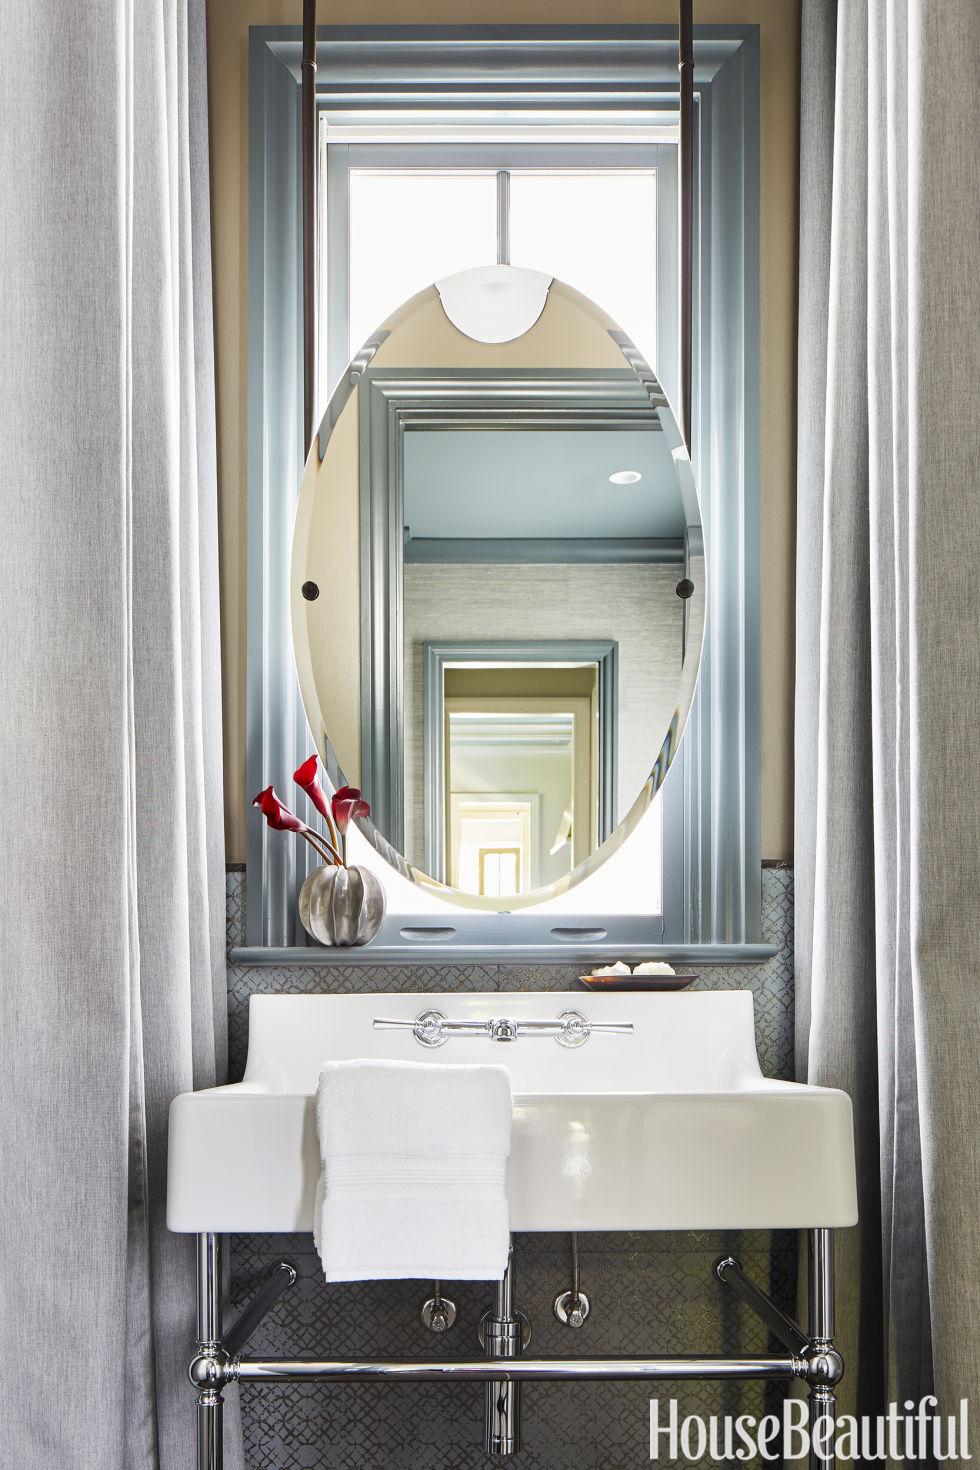 Bathroom Mirror In Front Of Window 140 best bathroom design ideas - decor pictures of stylish modern